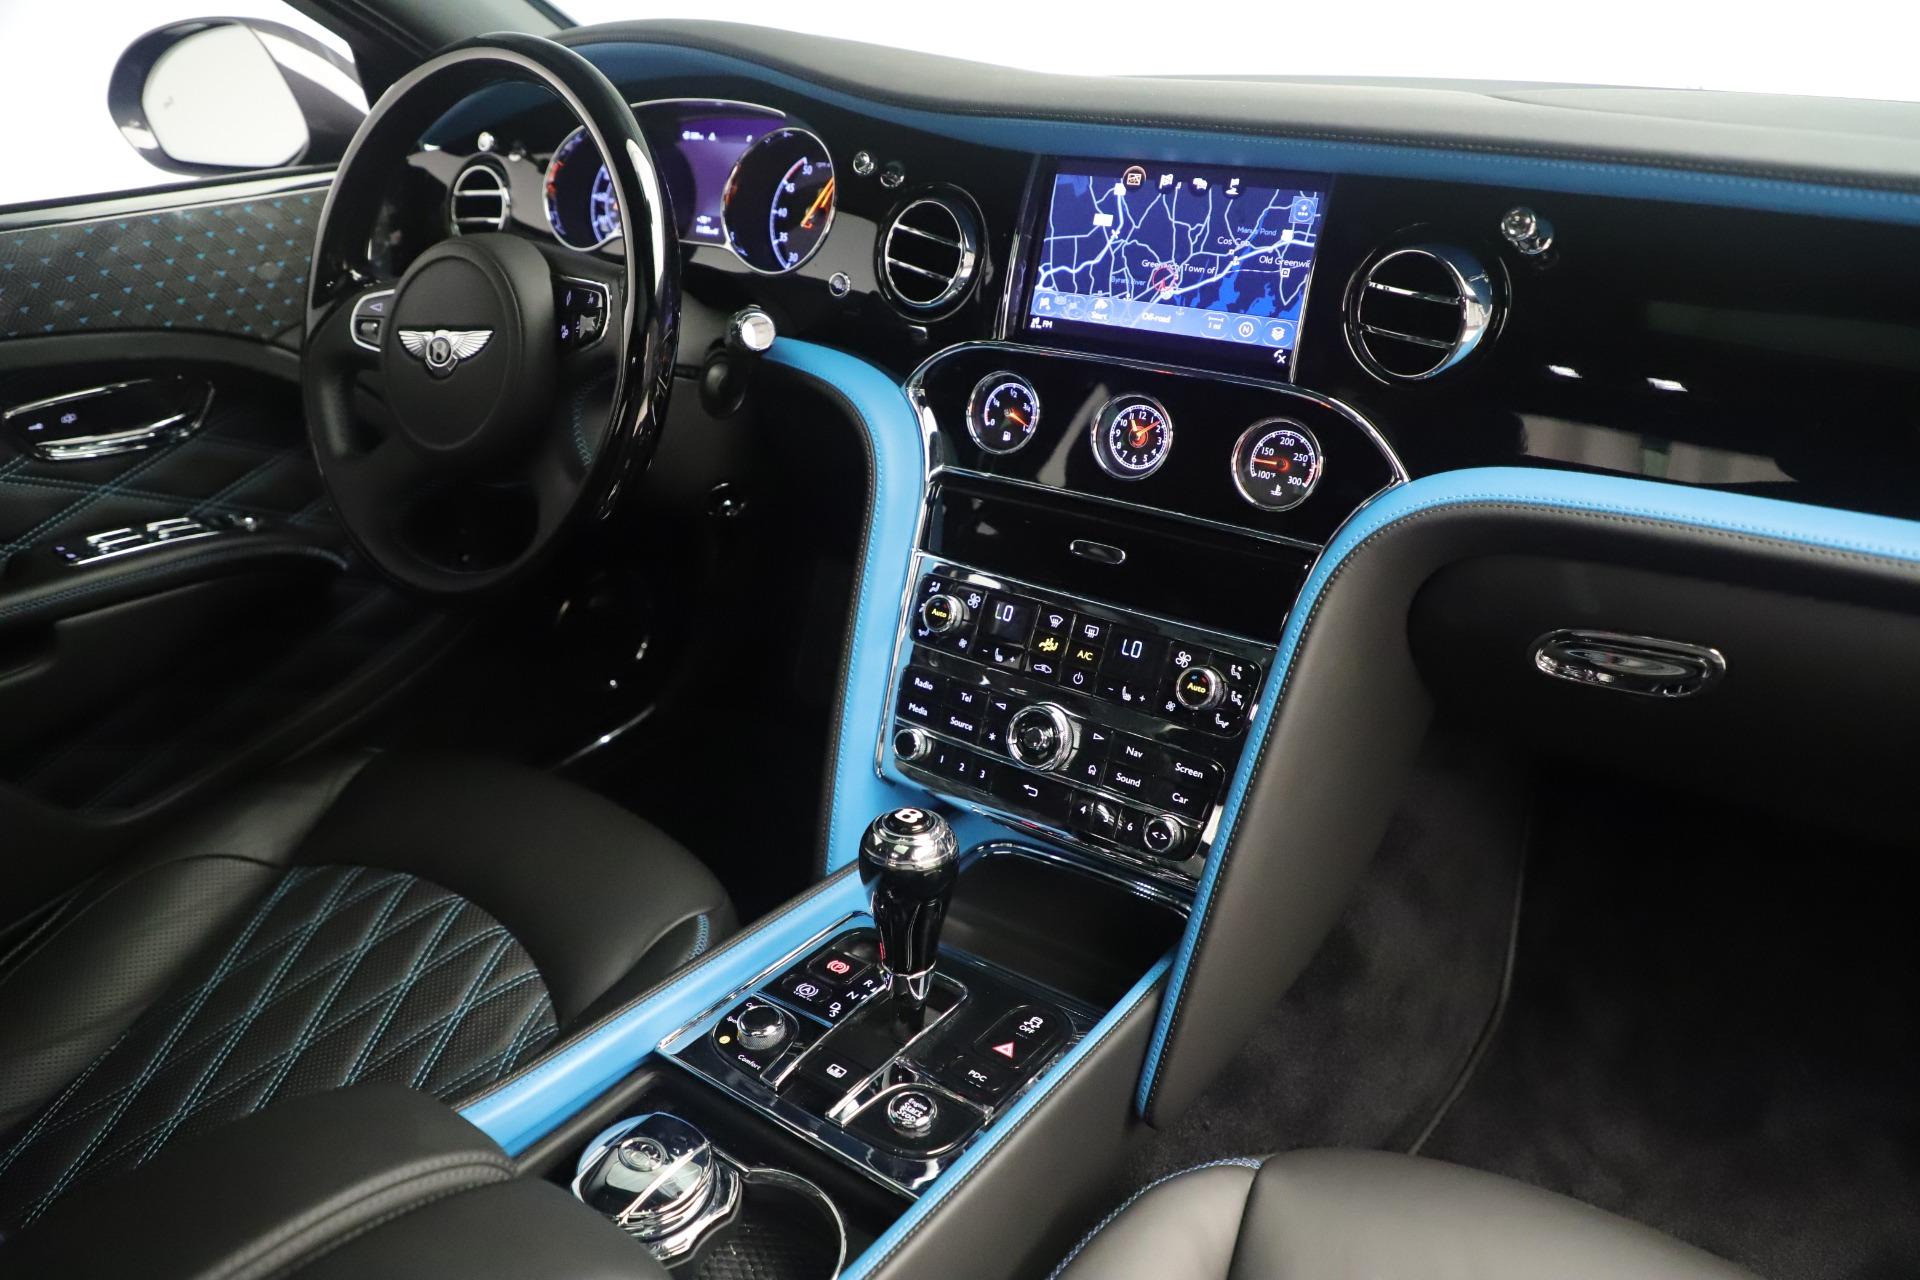 Used 2018 Bentley Mulsanne Speed Design Series For Sale In Westport, CT 3405_p33